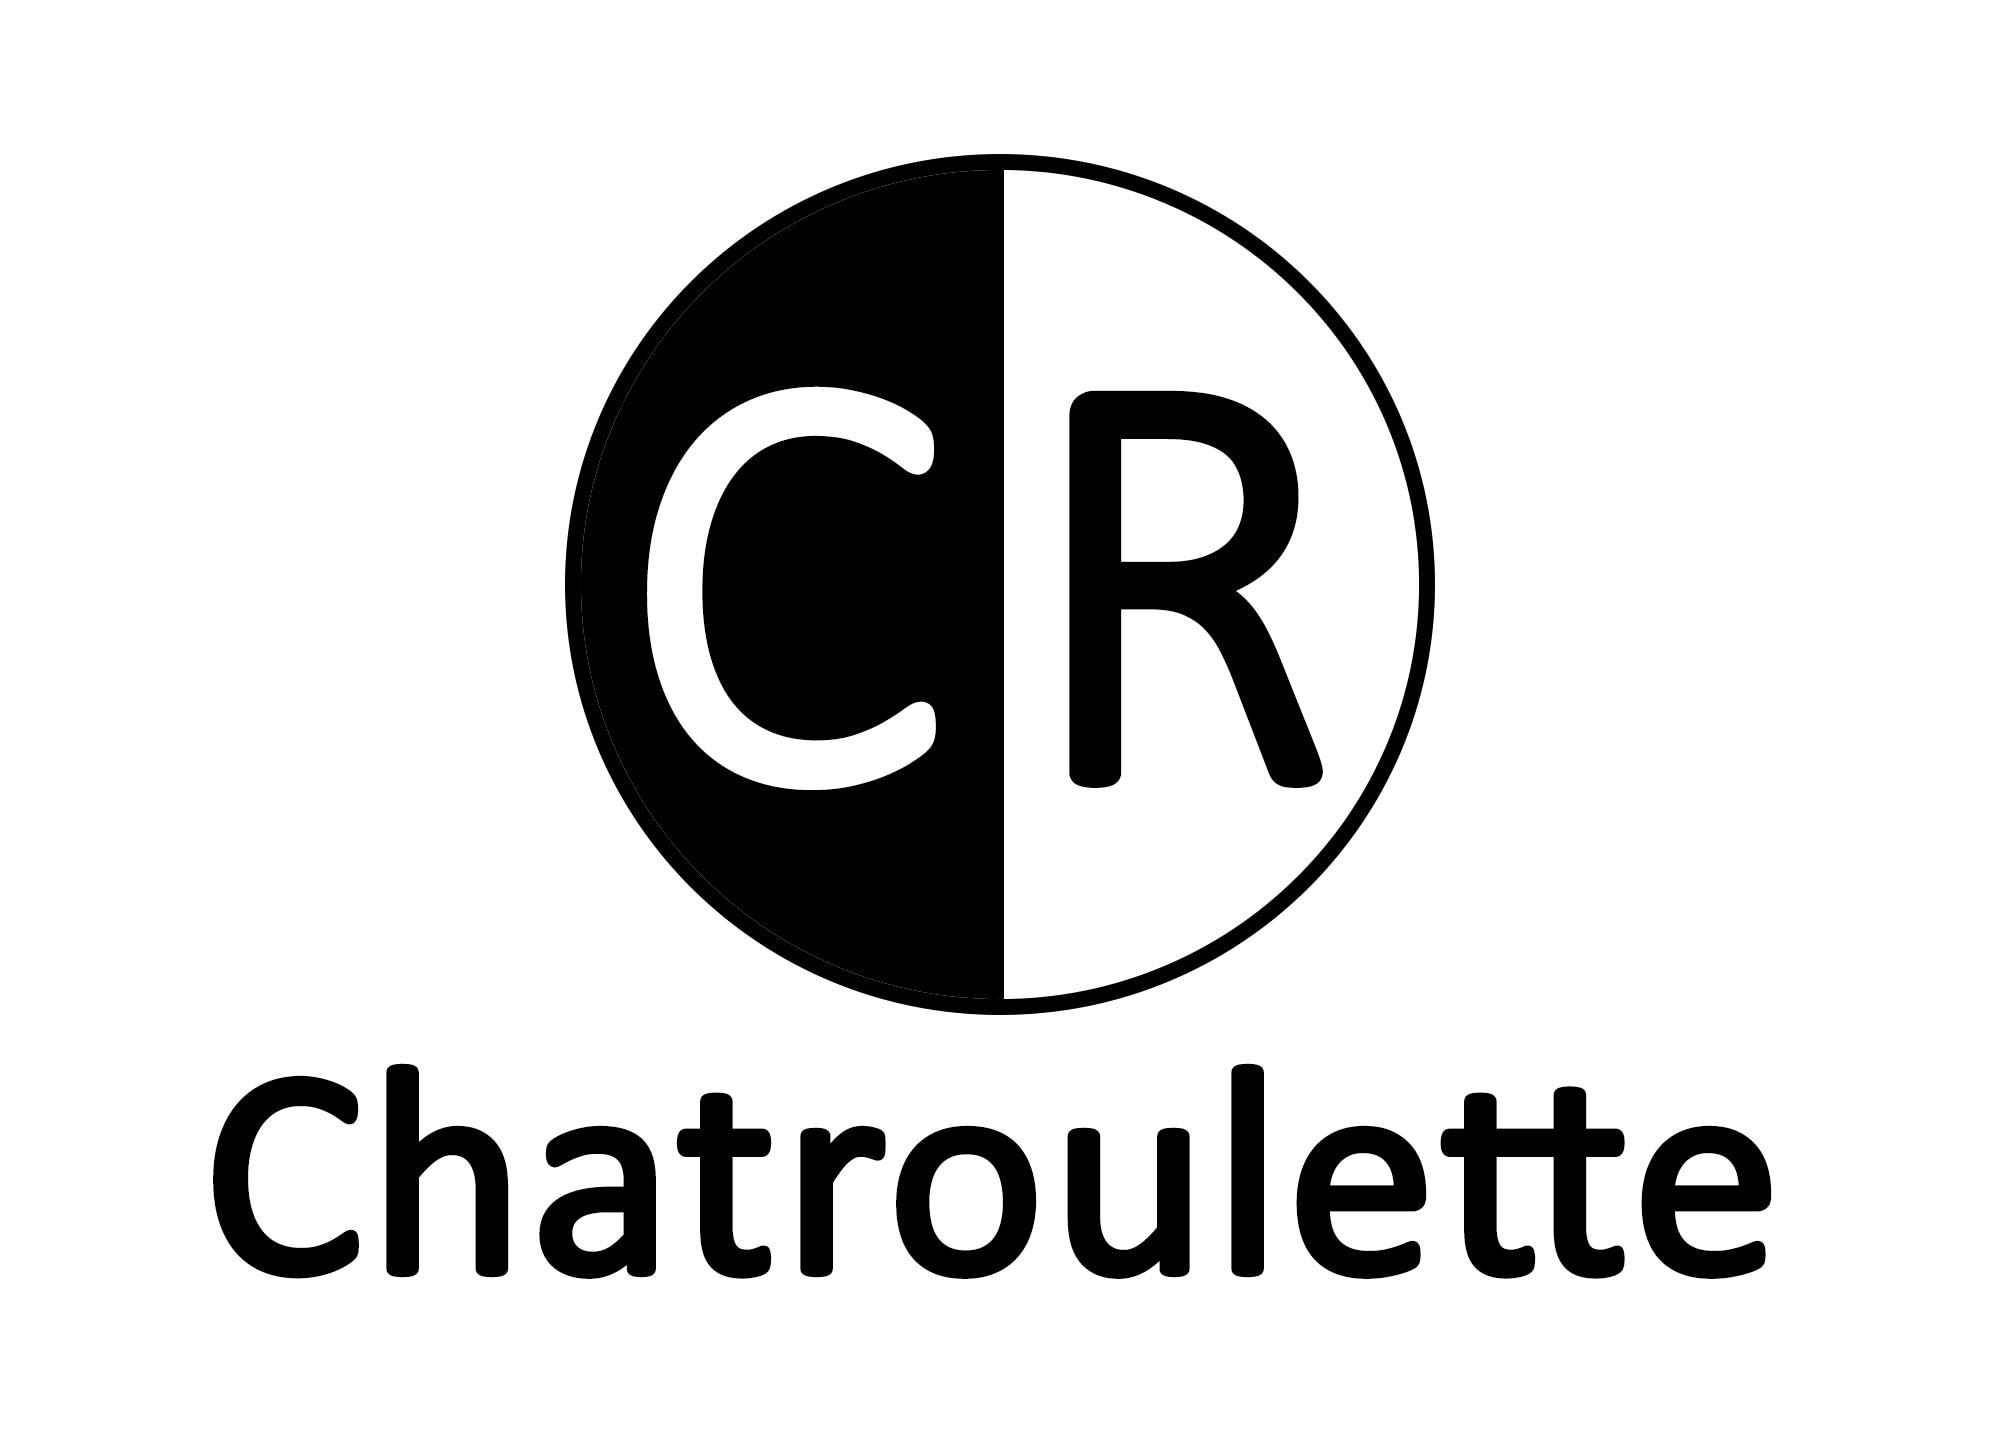 Login account chatroulette www.sct.co.in passwords